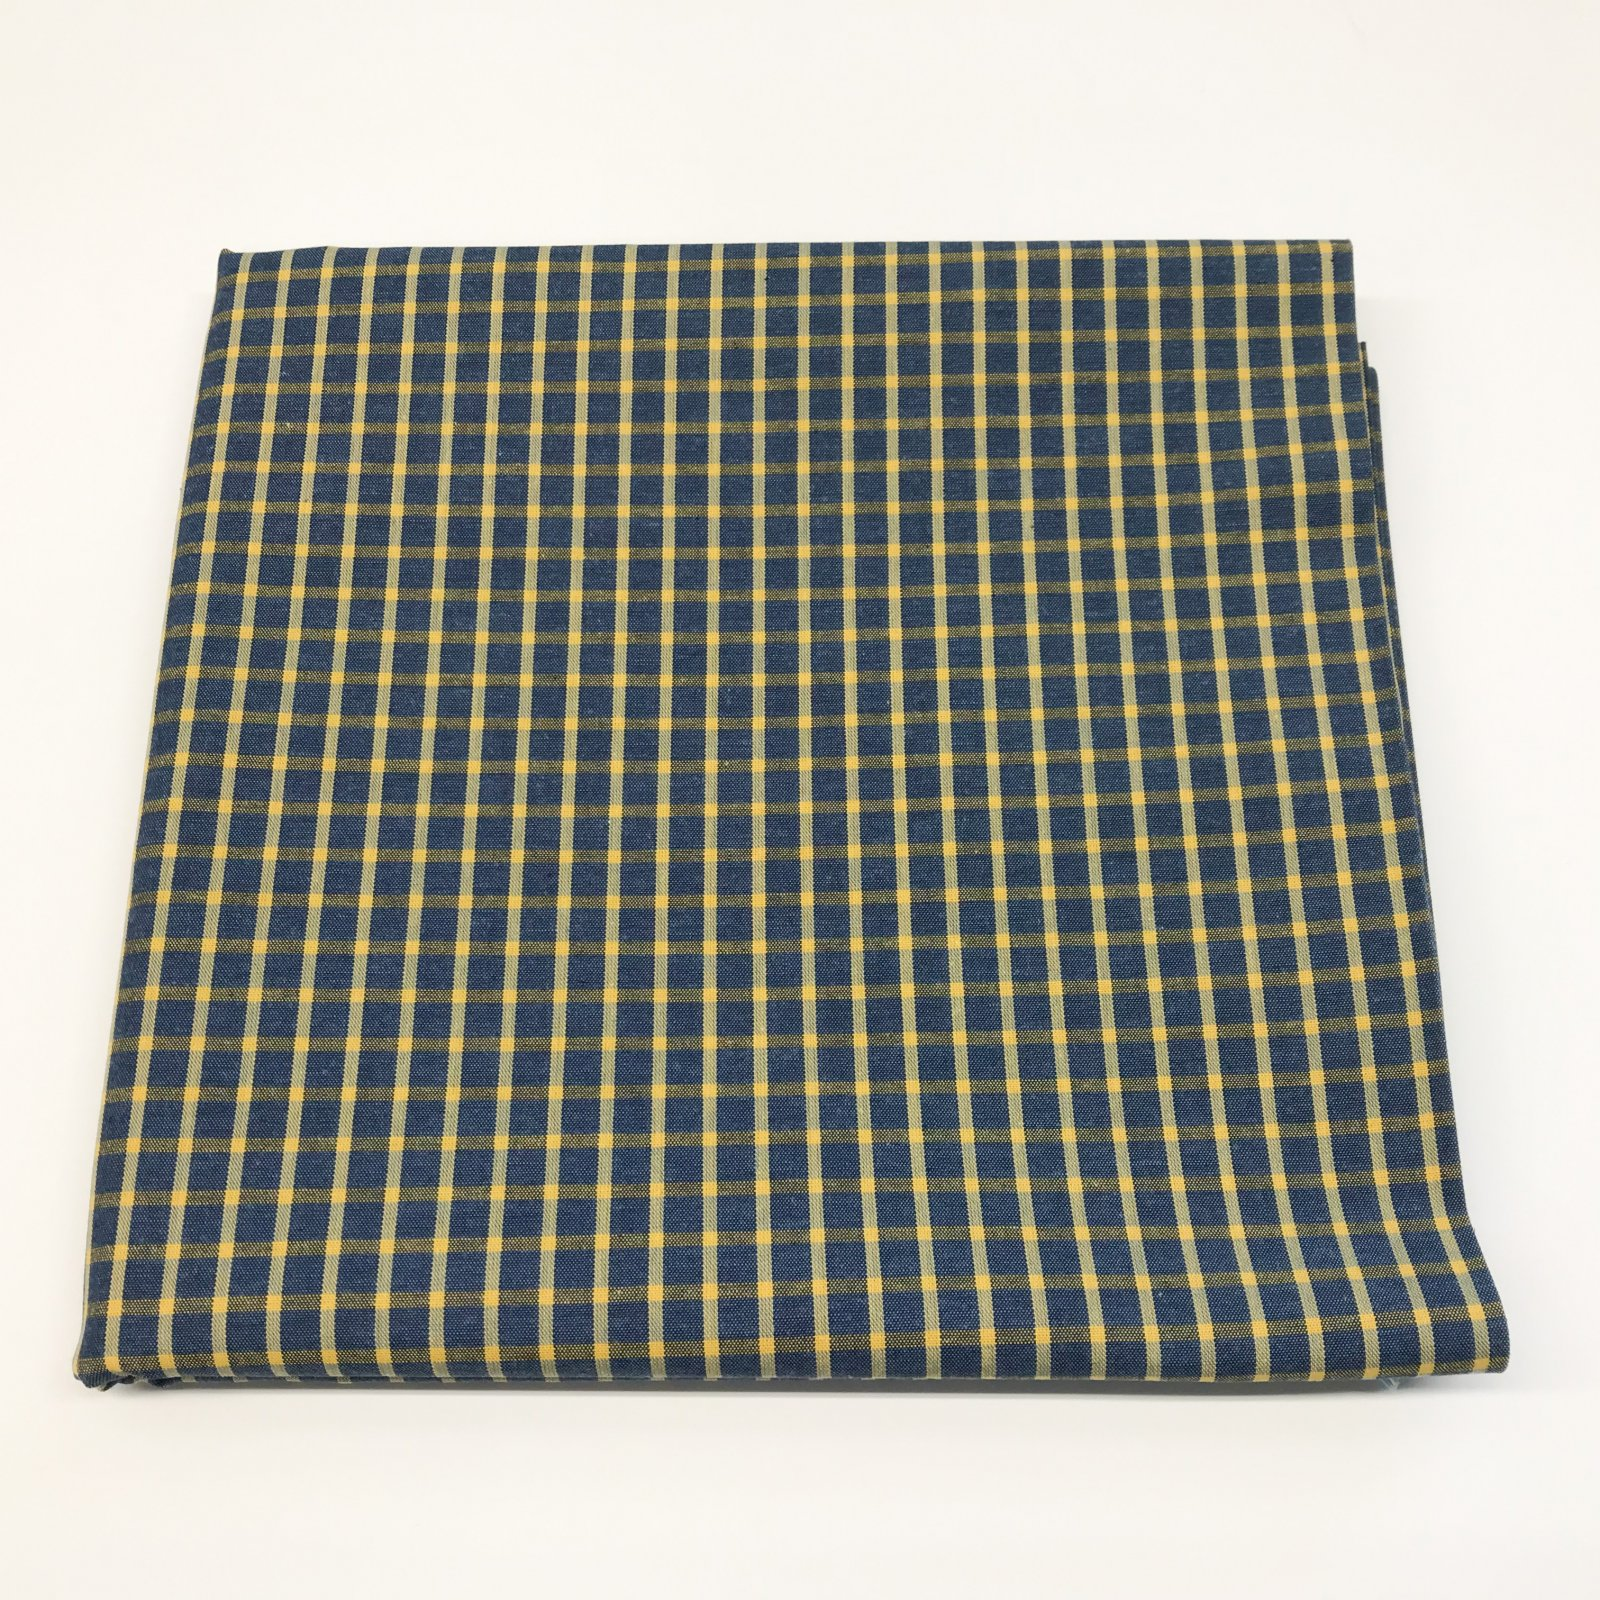 2 1/3 yards - Yarn Dyed Cotton - Blue & Yellow Windowpane Shirting